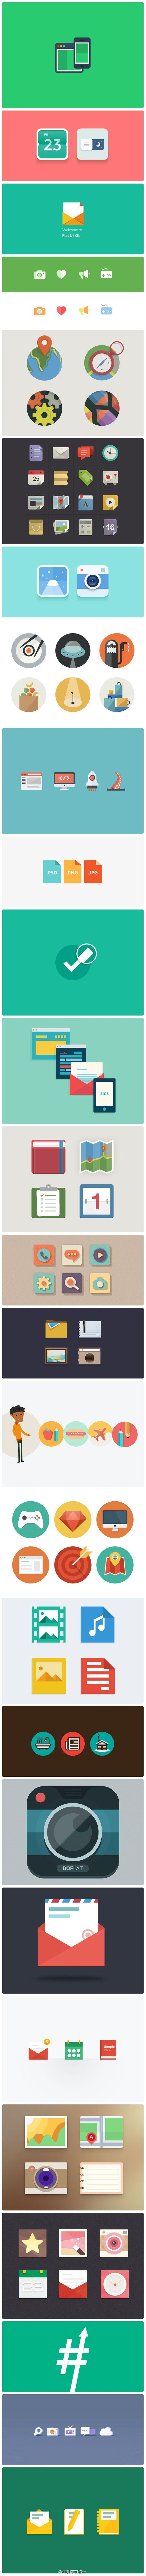 Flat designs #GraphicDesign